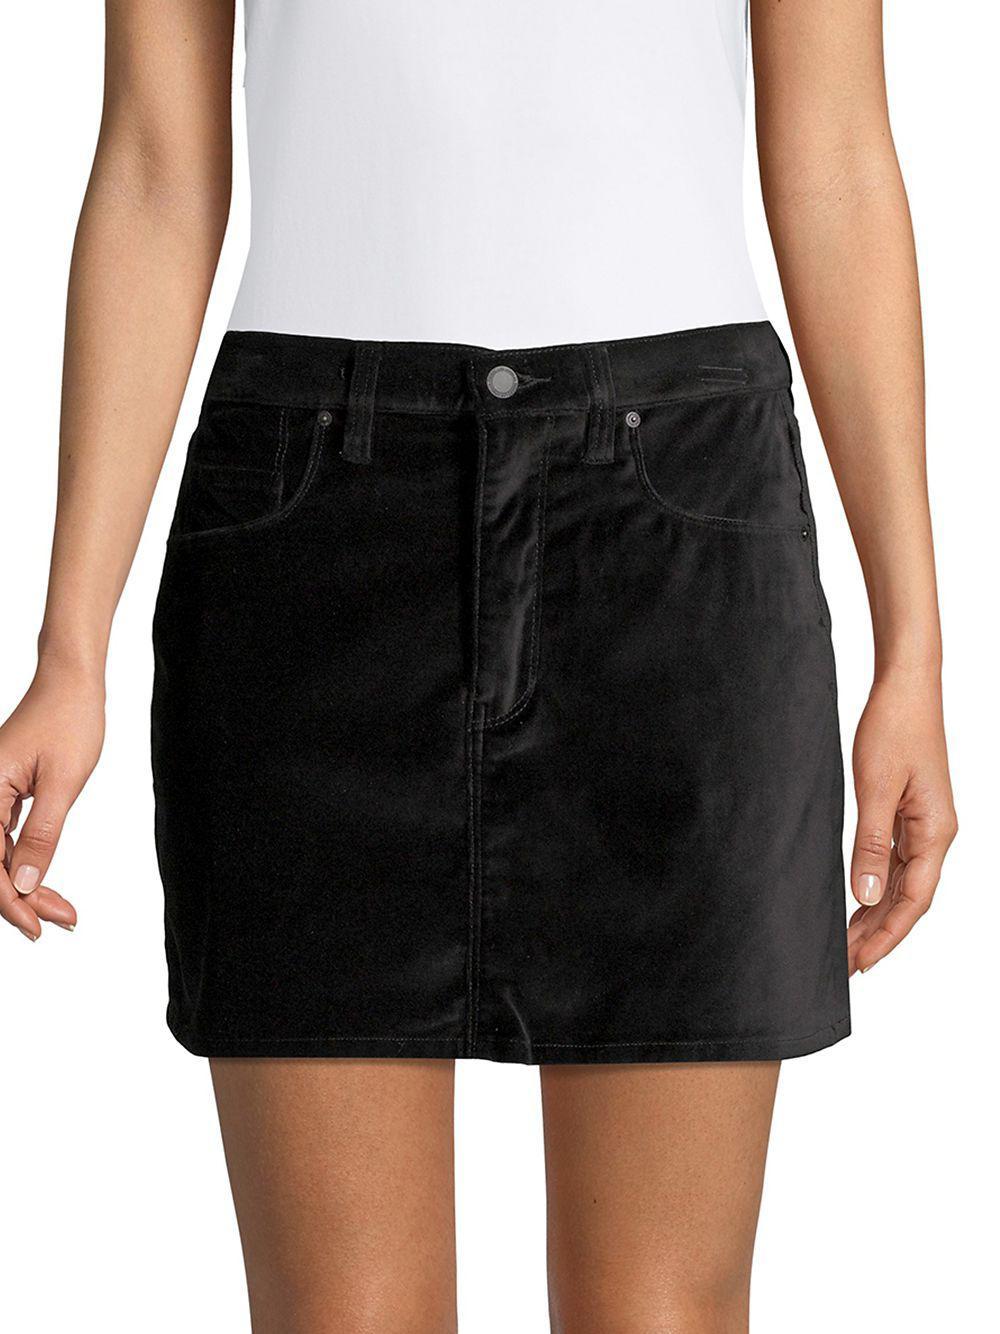 a2fe73ff3 Hudson Jeans Viper Corduroy Mini Skirt in Black - Lyst